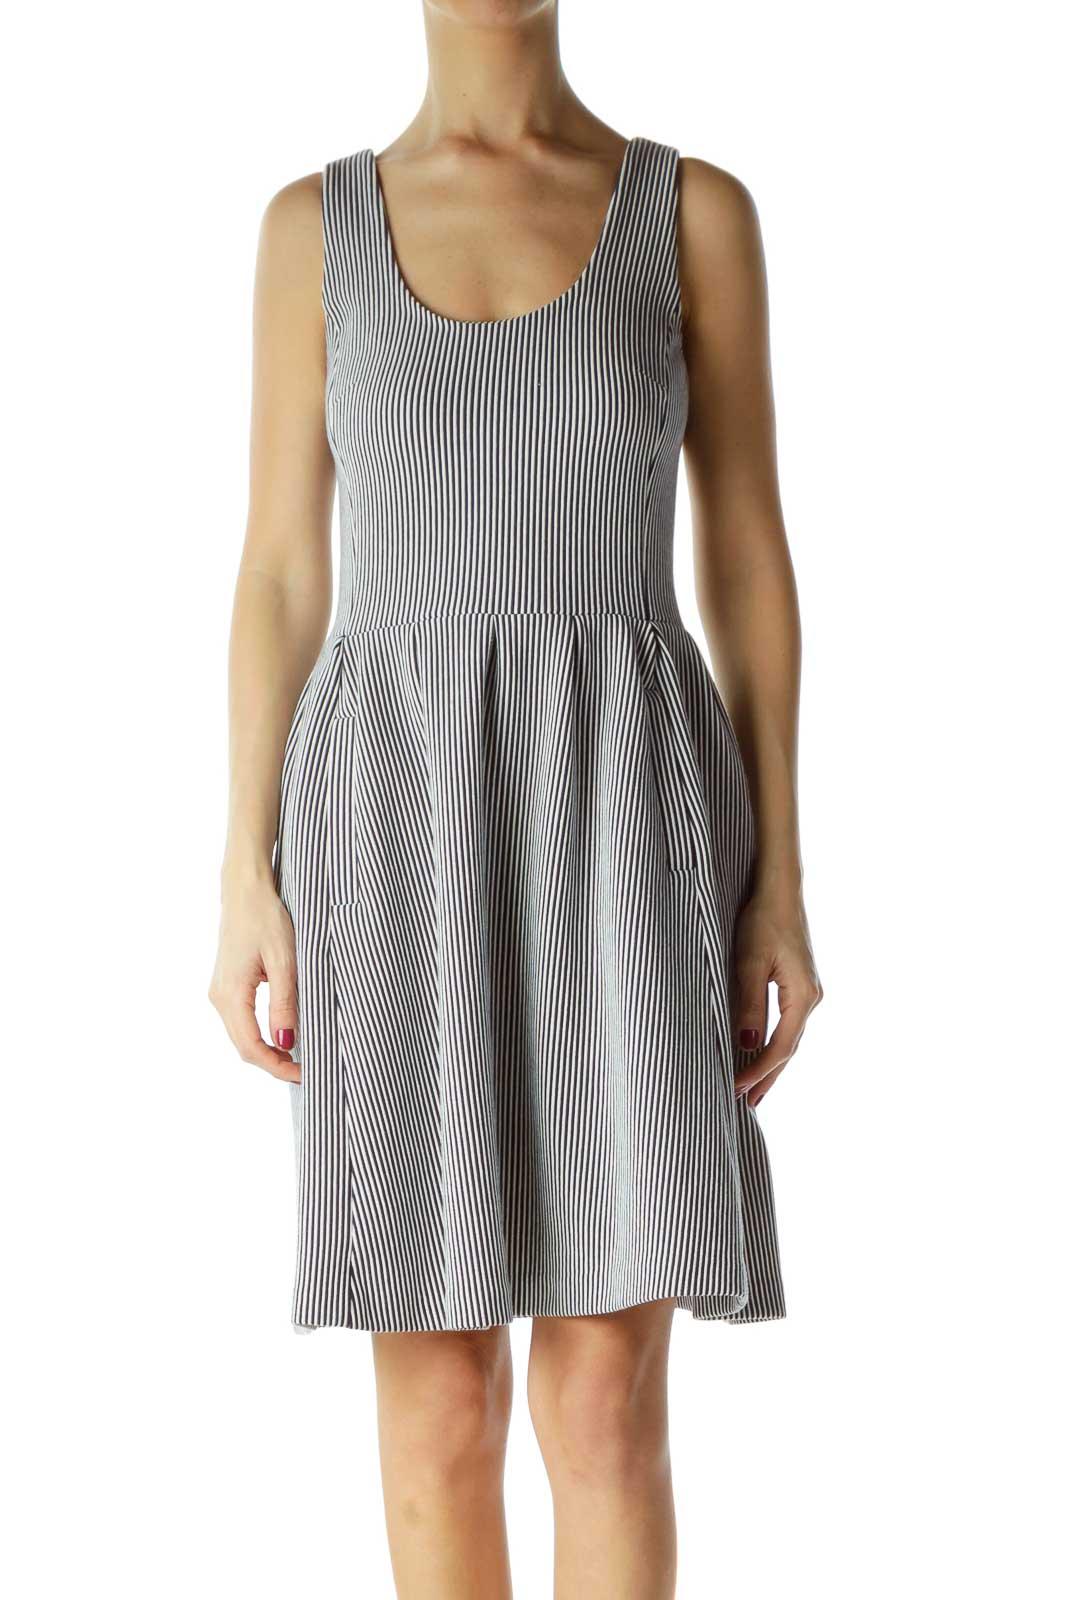 Navy White Stripe Knit A-Line Dress